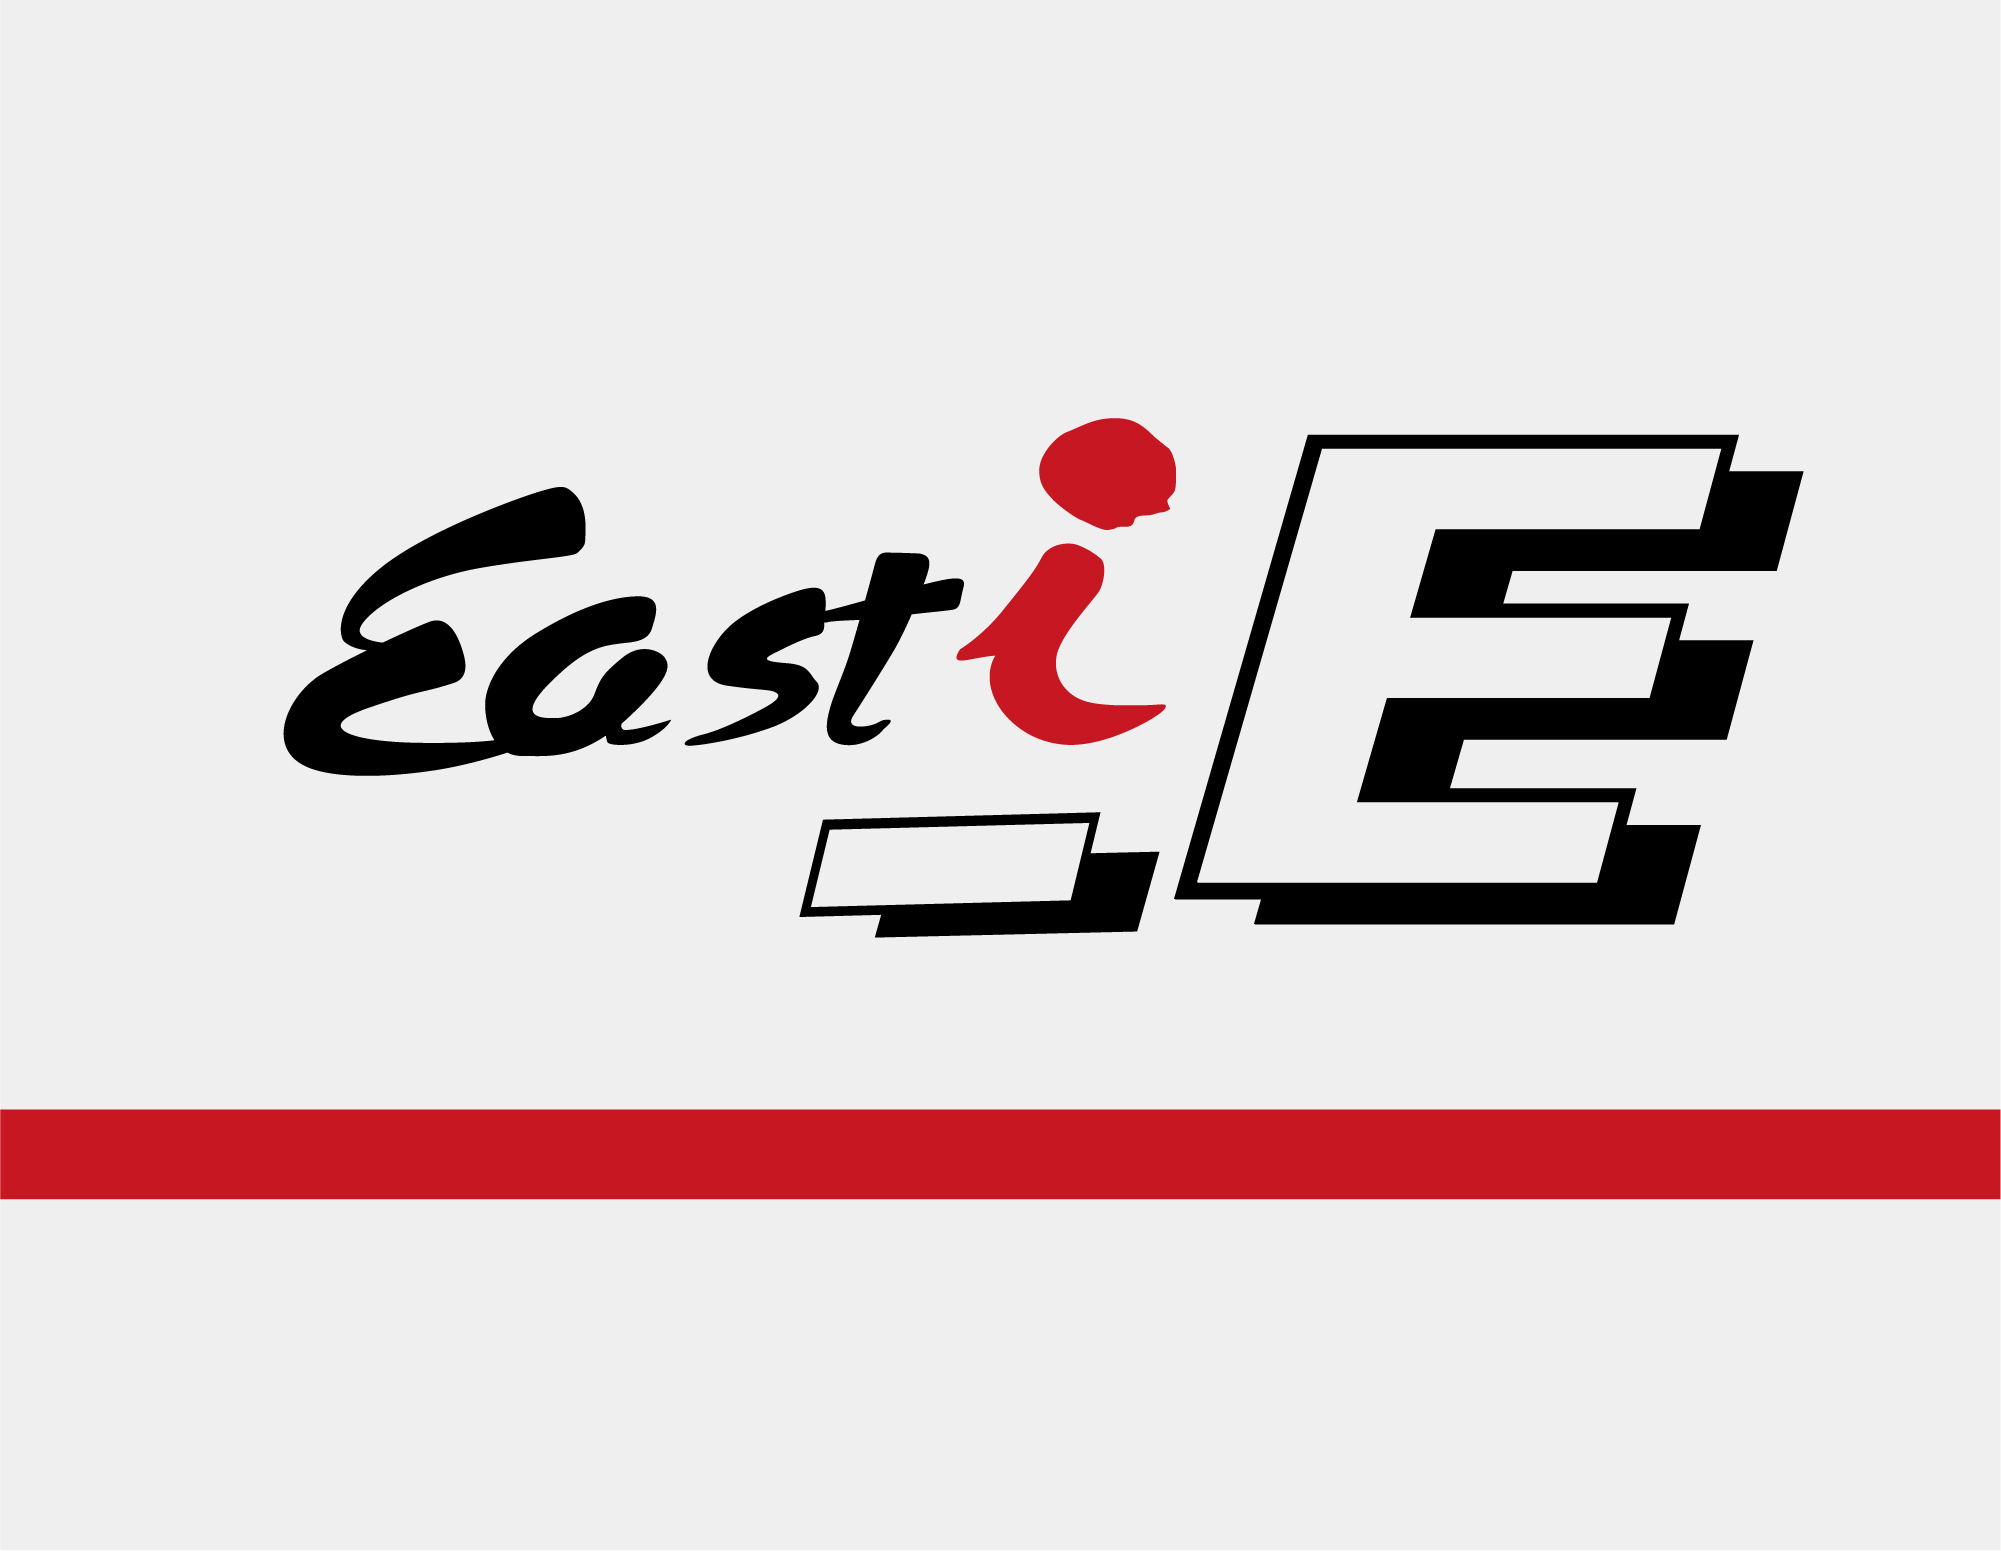 easti-eロゴマーク